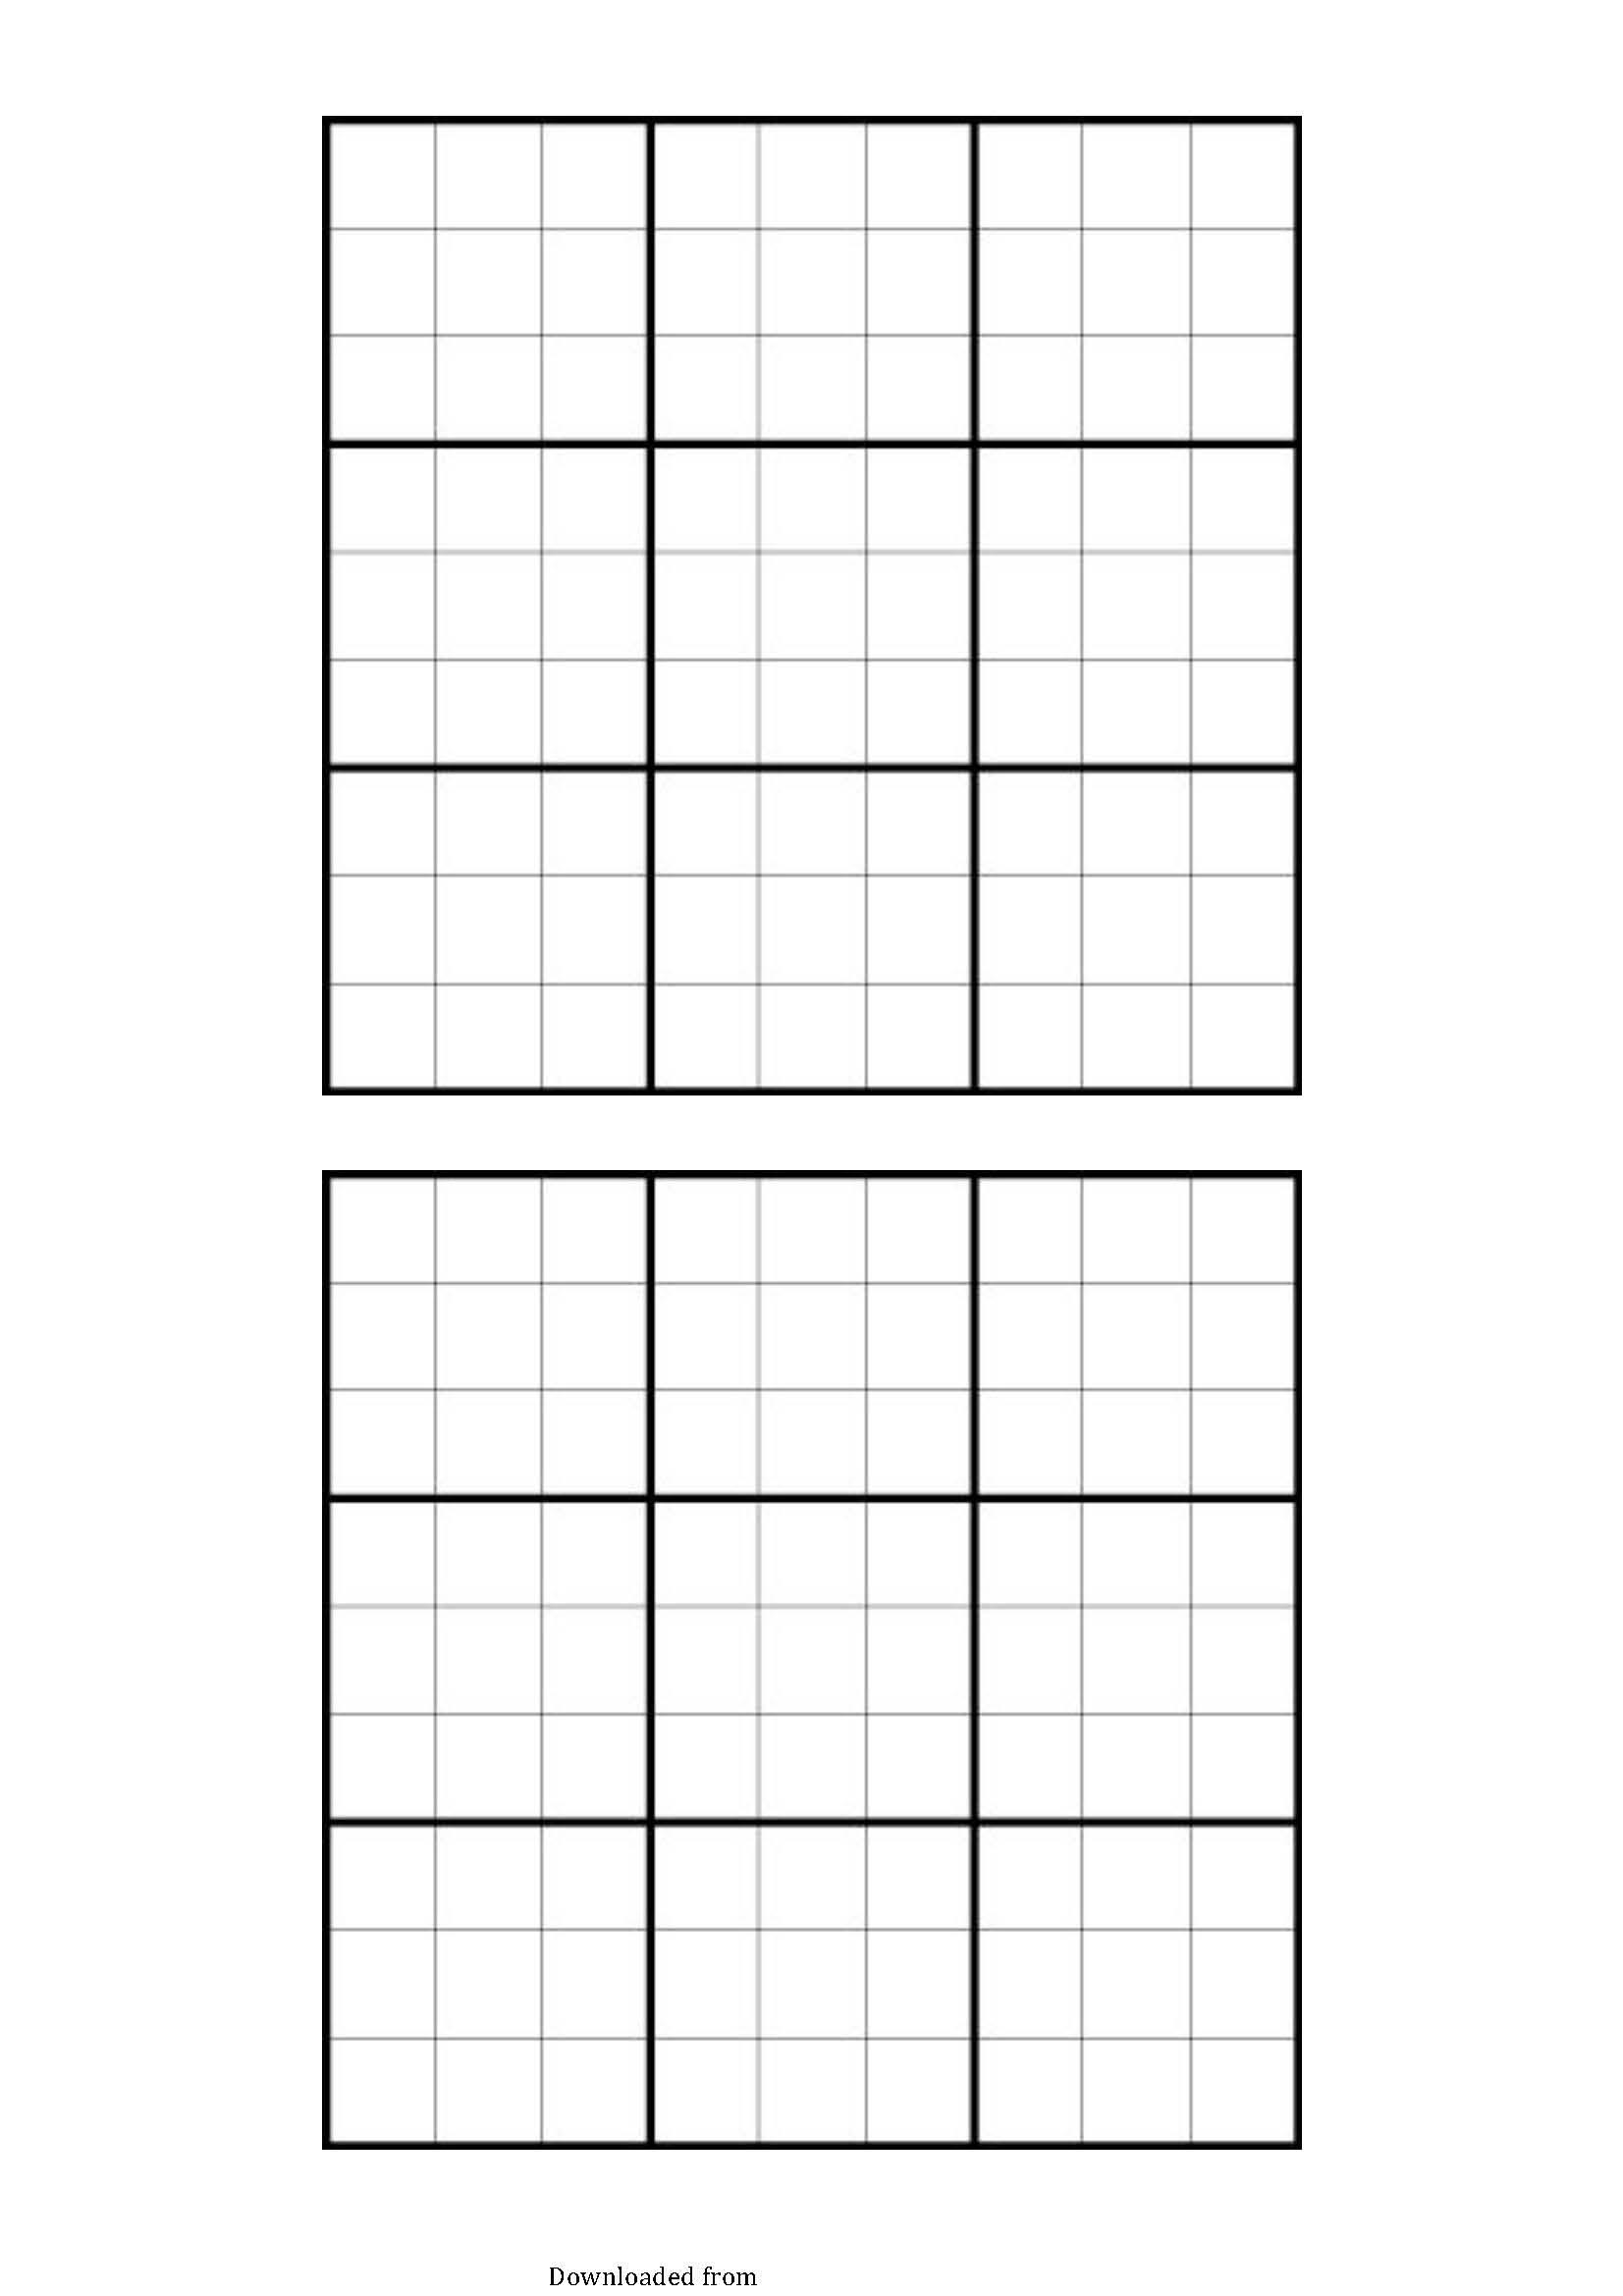 Empty Sudoku Grid Printable